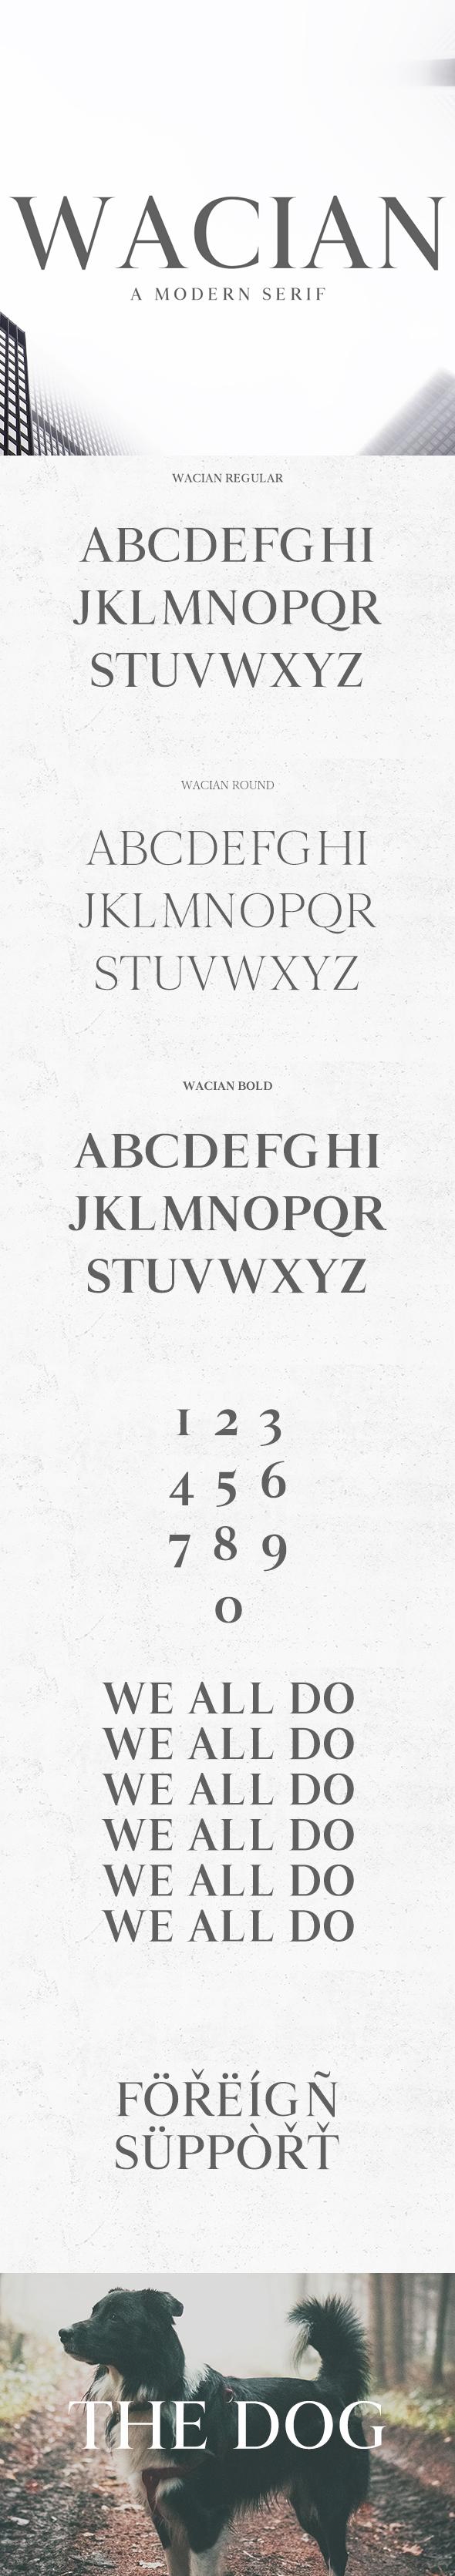 Wacian Serif Font Family - Serif Fonts